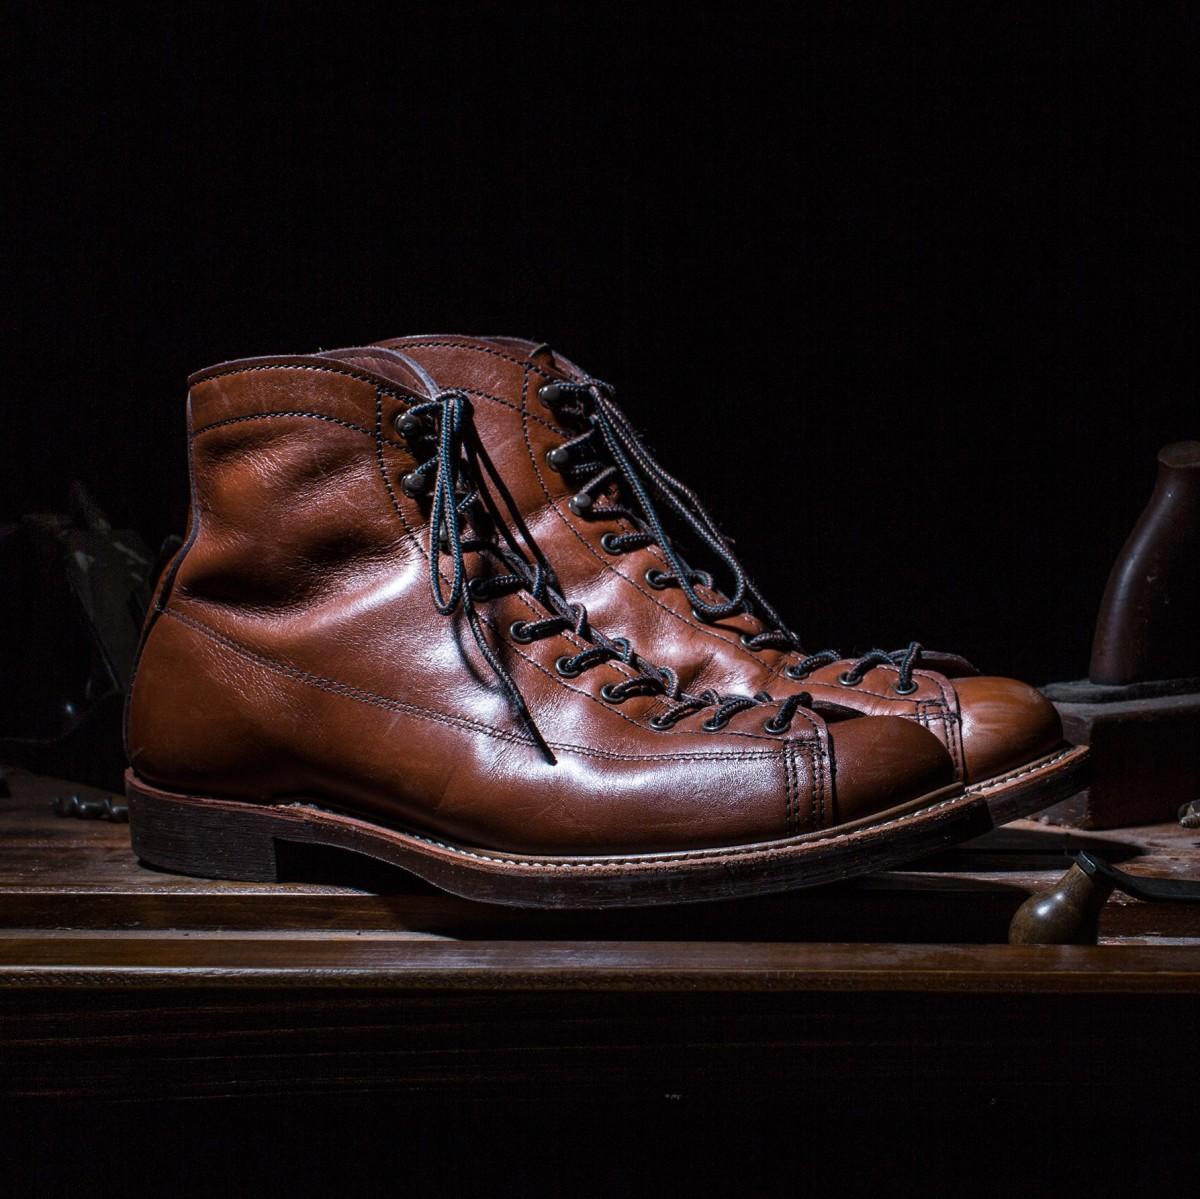 Lineman Boots